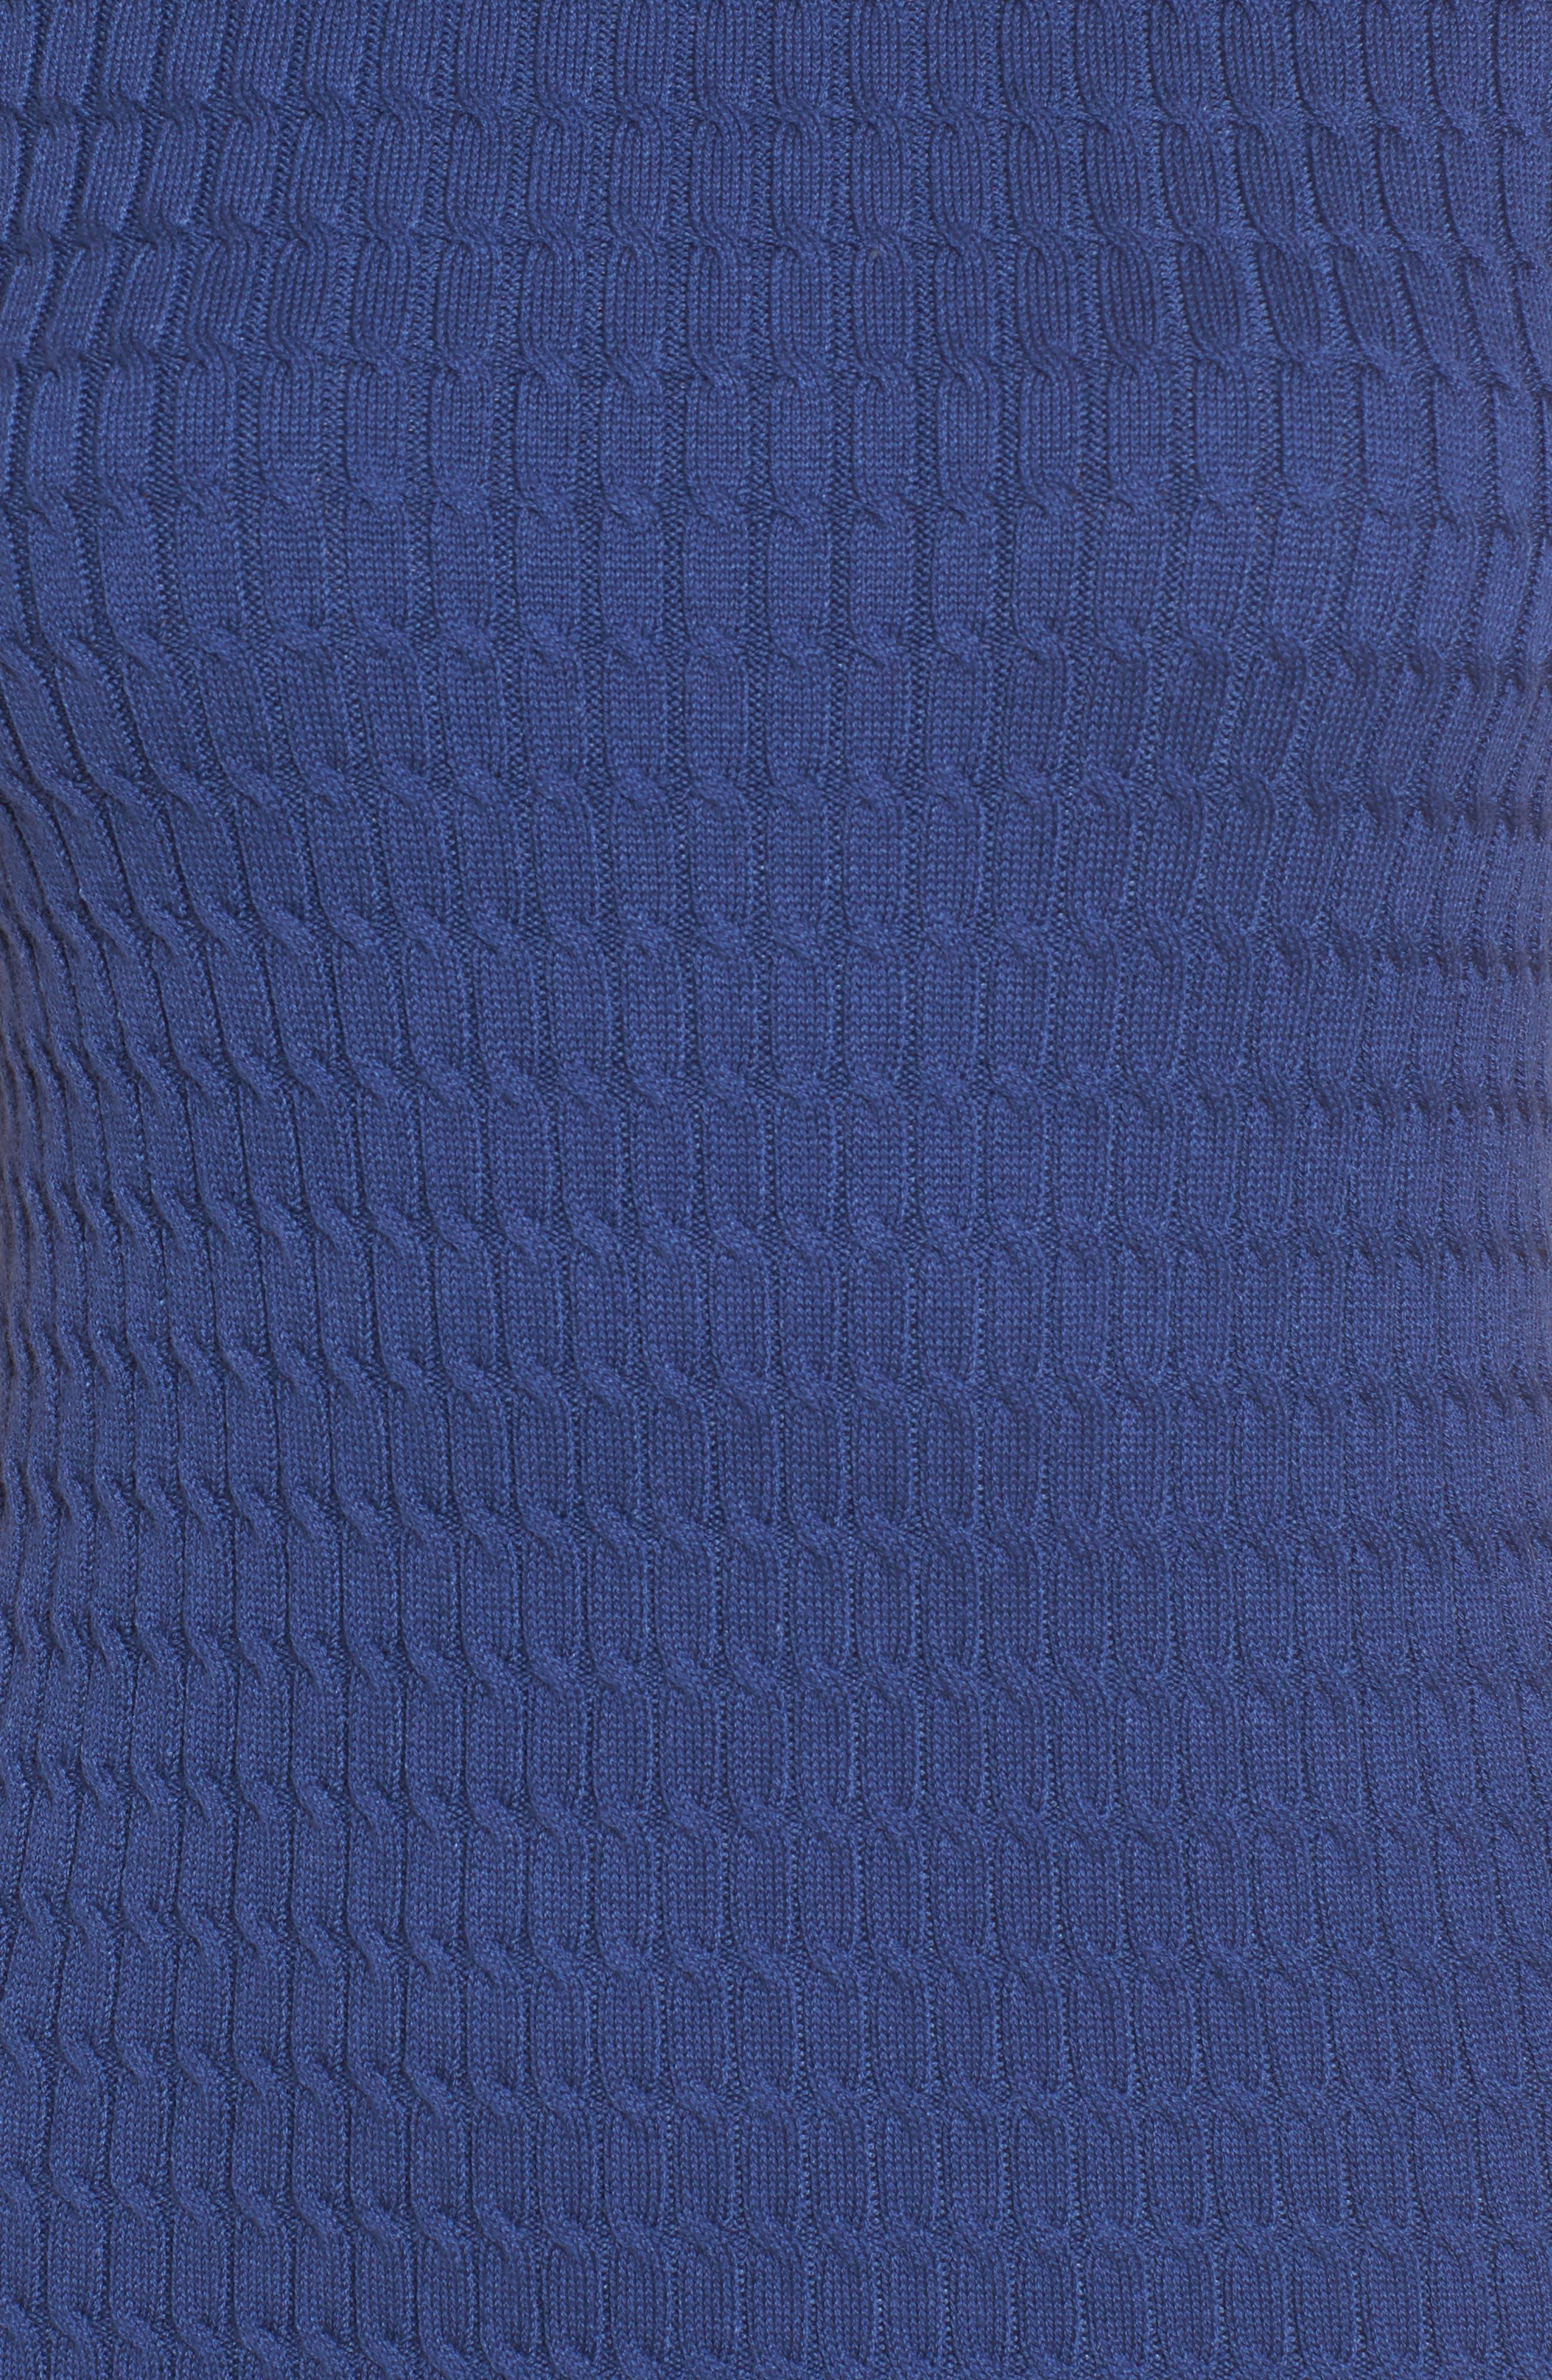 Sleeveless Turtleneck Dress,                             Alternate thumbnail 5, color,                             ECLIPSE